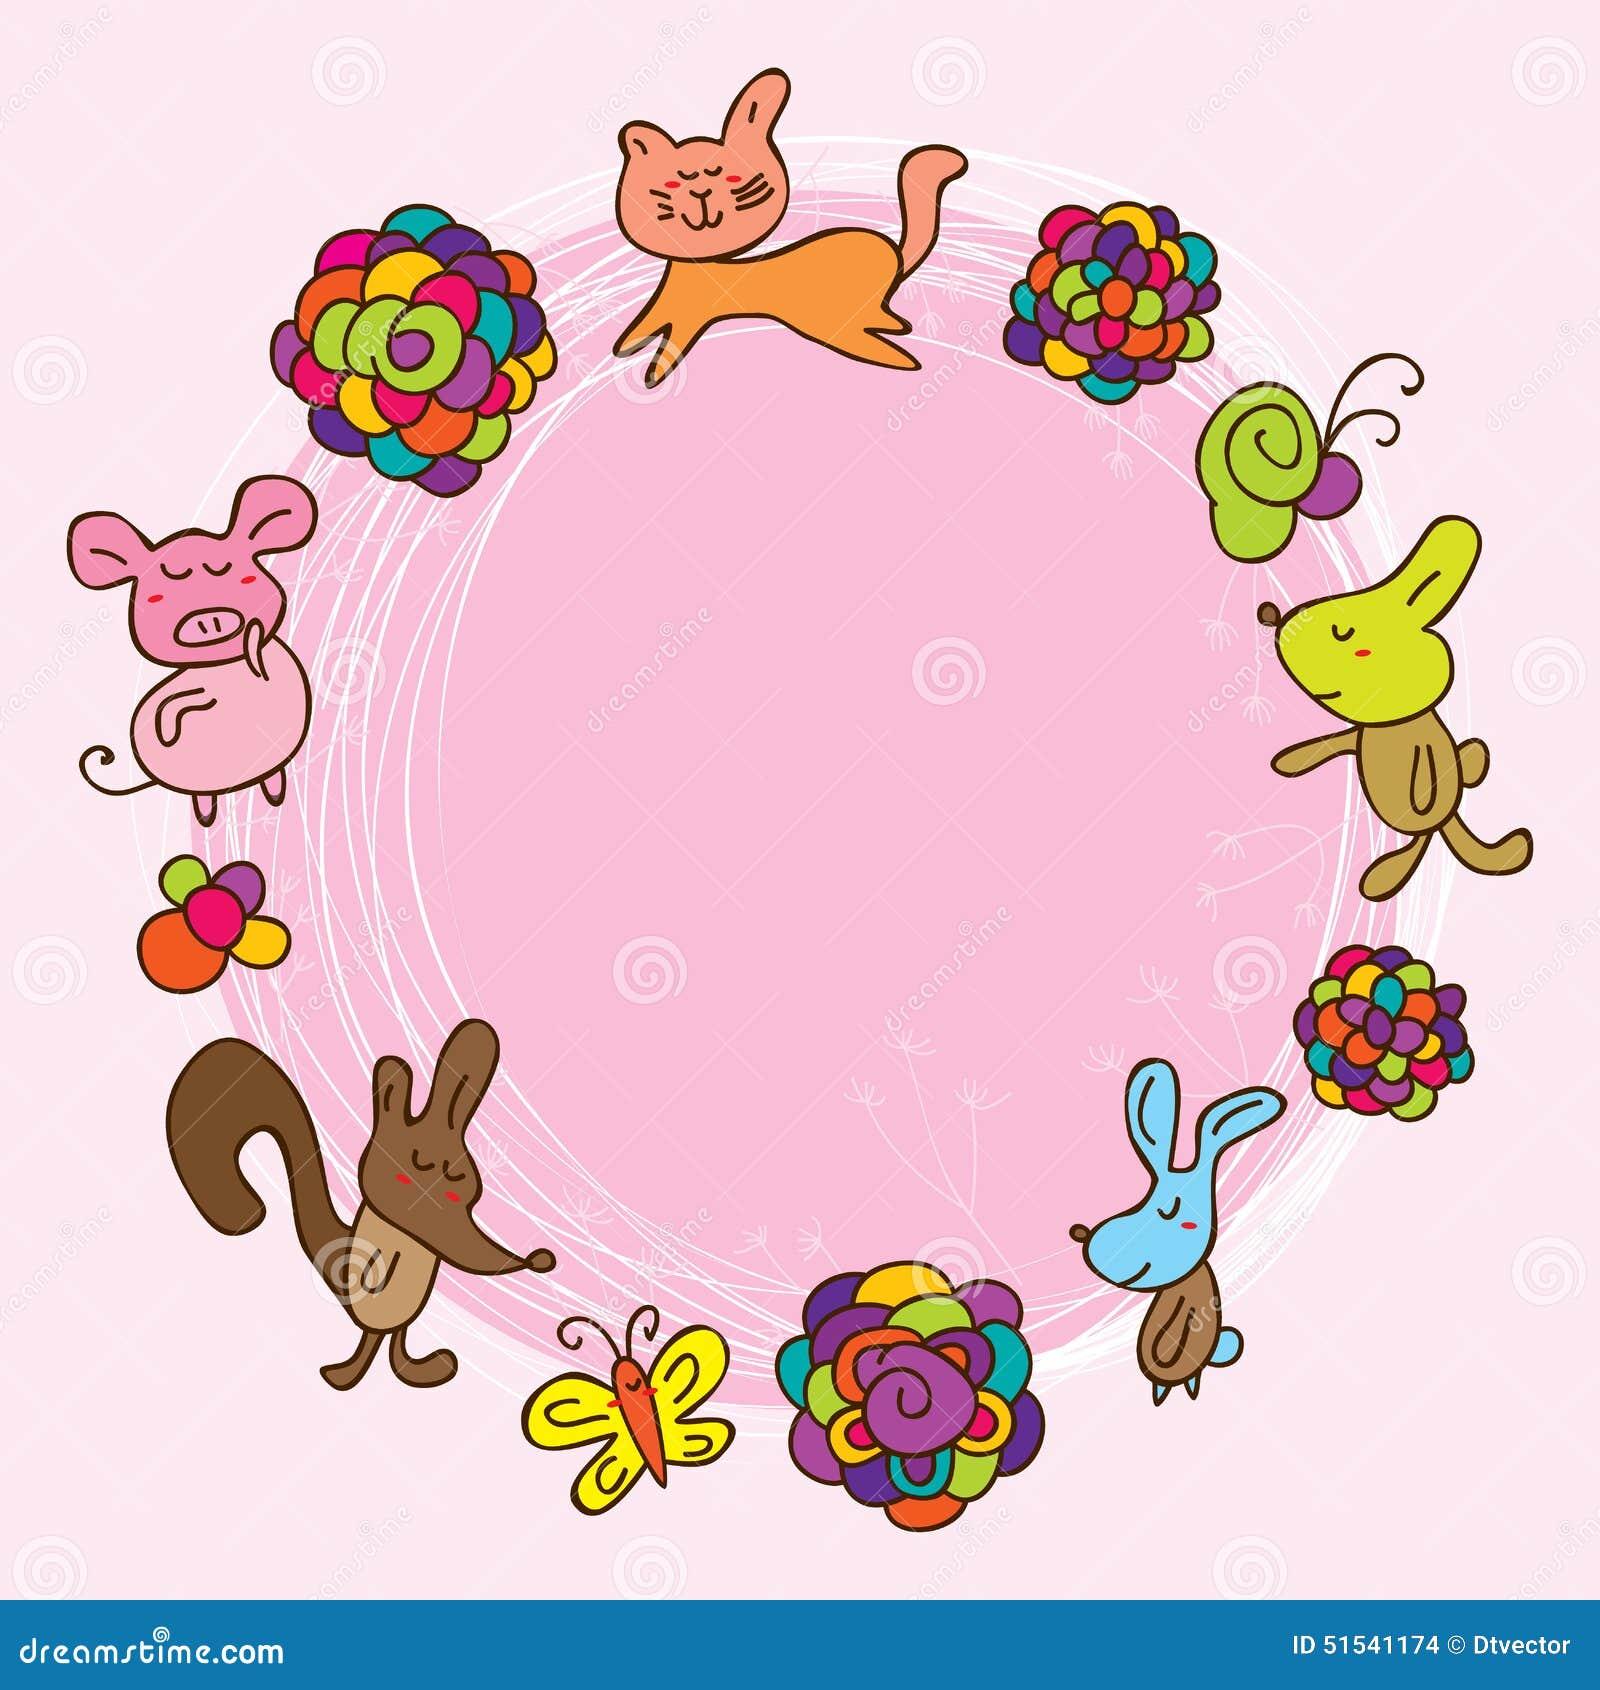 Cartoon kid flower pink flower card stock vector illustration of download cartoon kid flower pink flower card stock vector illustration of color cute mightylinksfo